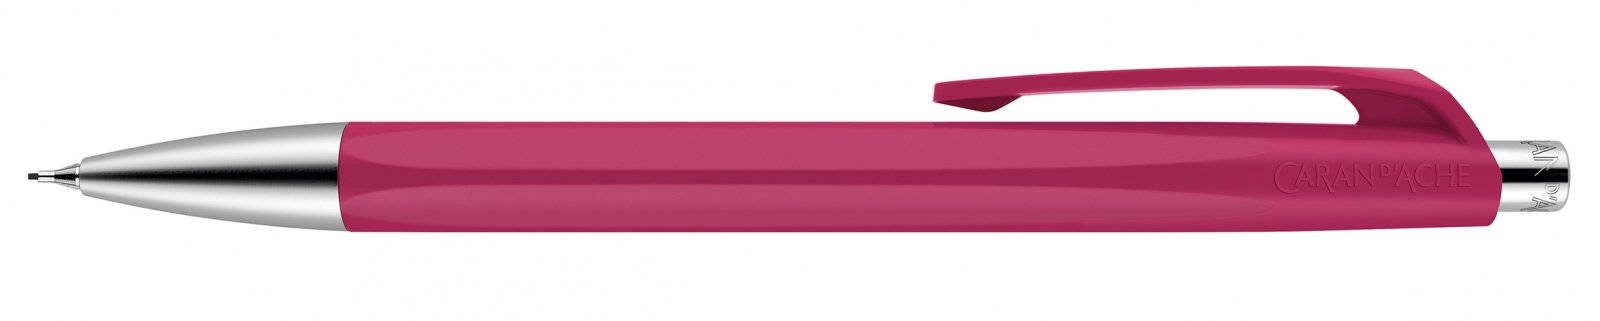 LAPISEIRA 0,7mm 884.280 INFINITE ROSA